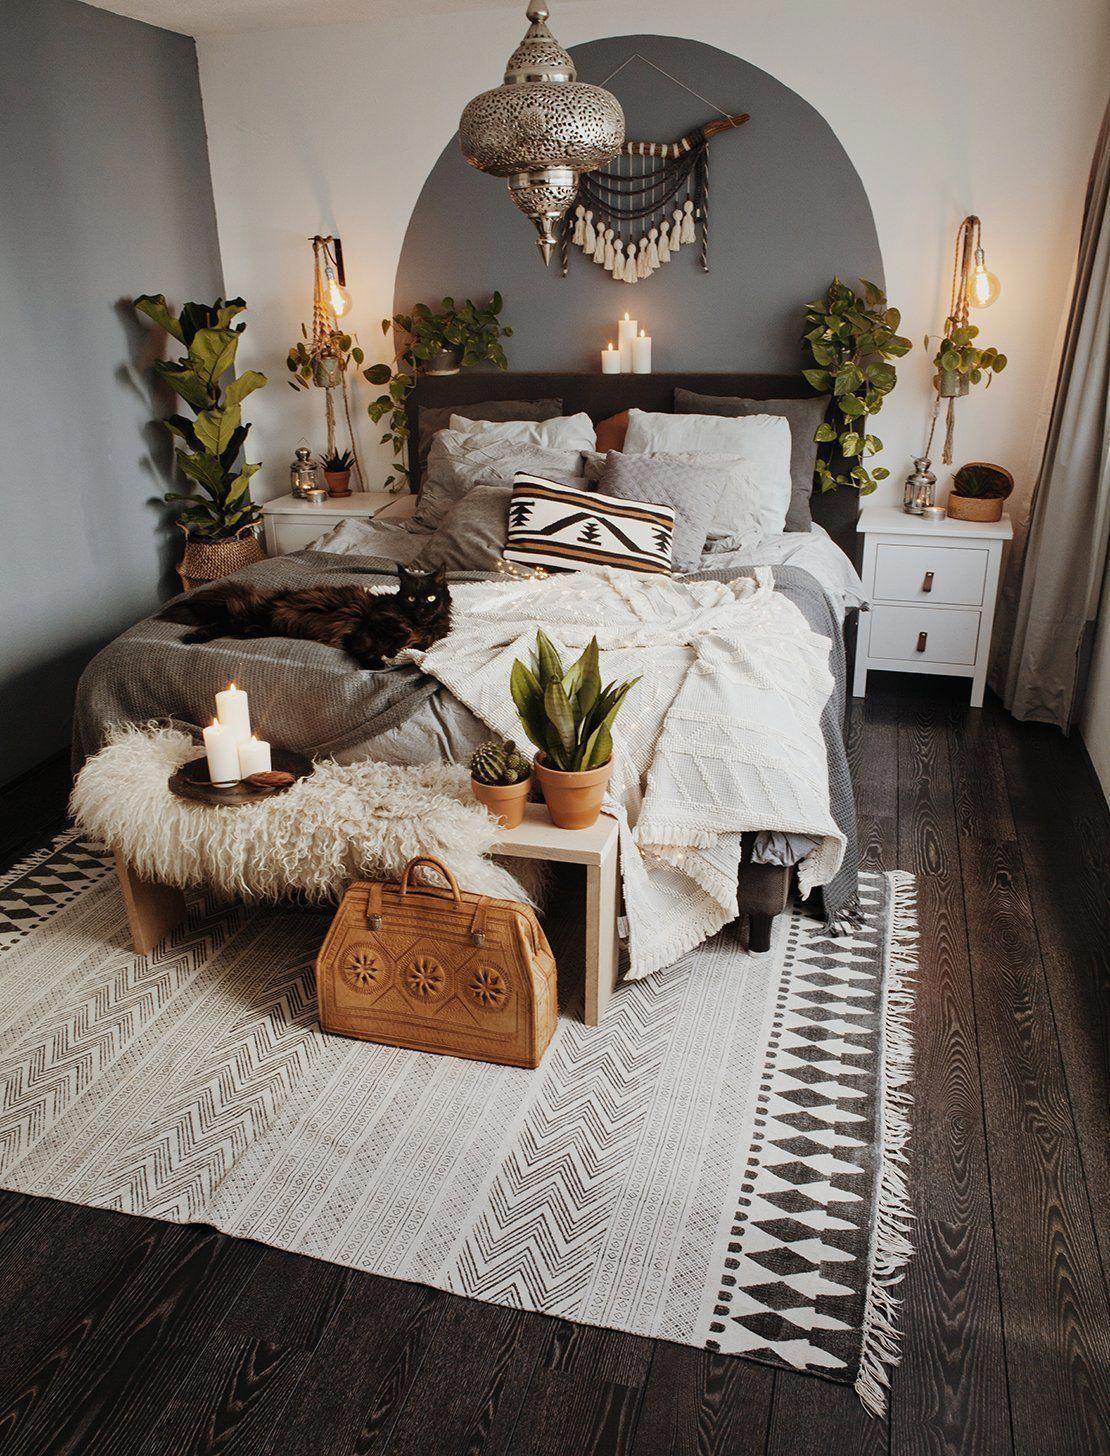 Home Decor Inspiration These Scandinavian Design Ideas Will Elevate Your Scandinavian Home Decor Today Beautifulli Bedroom Decor House Interior Home Bedroom